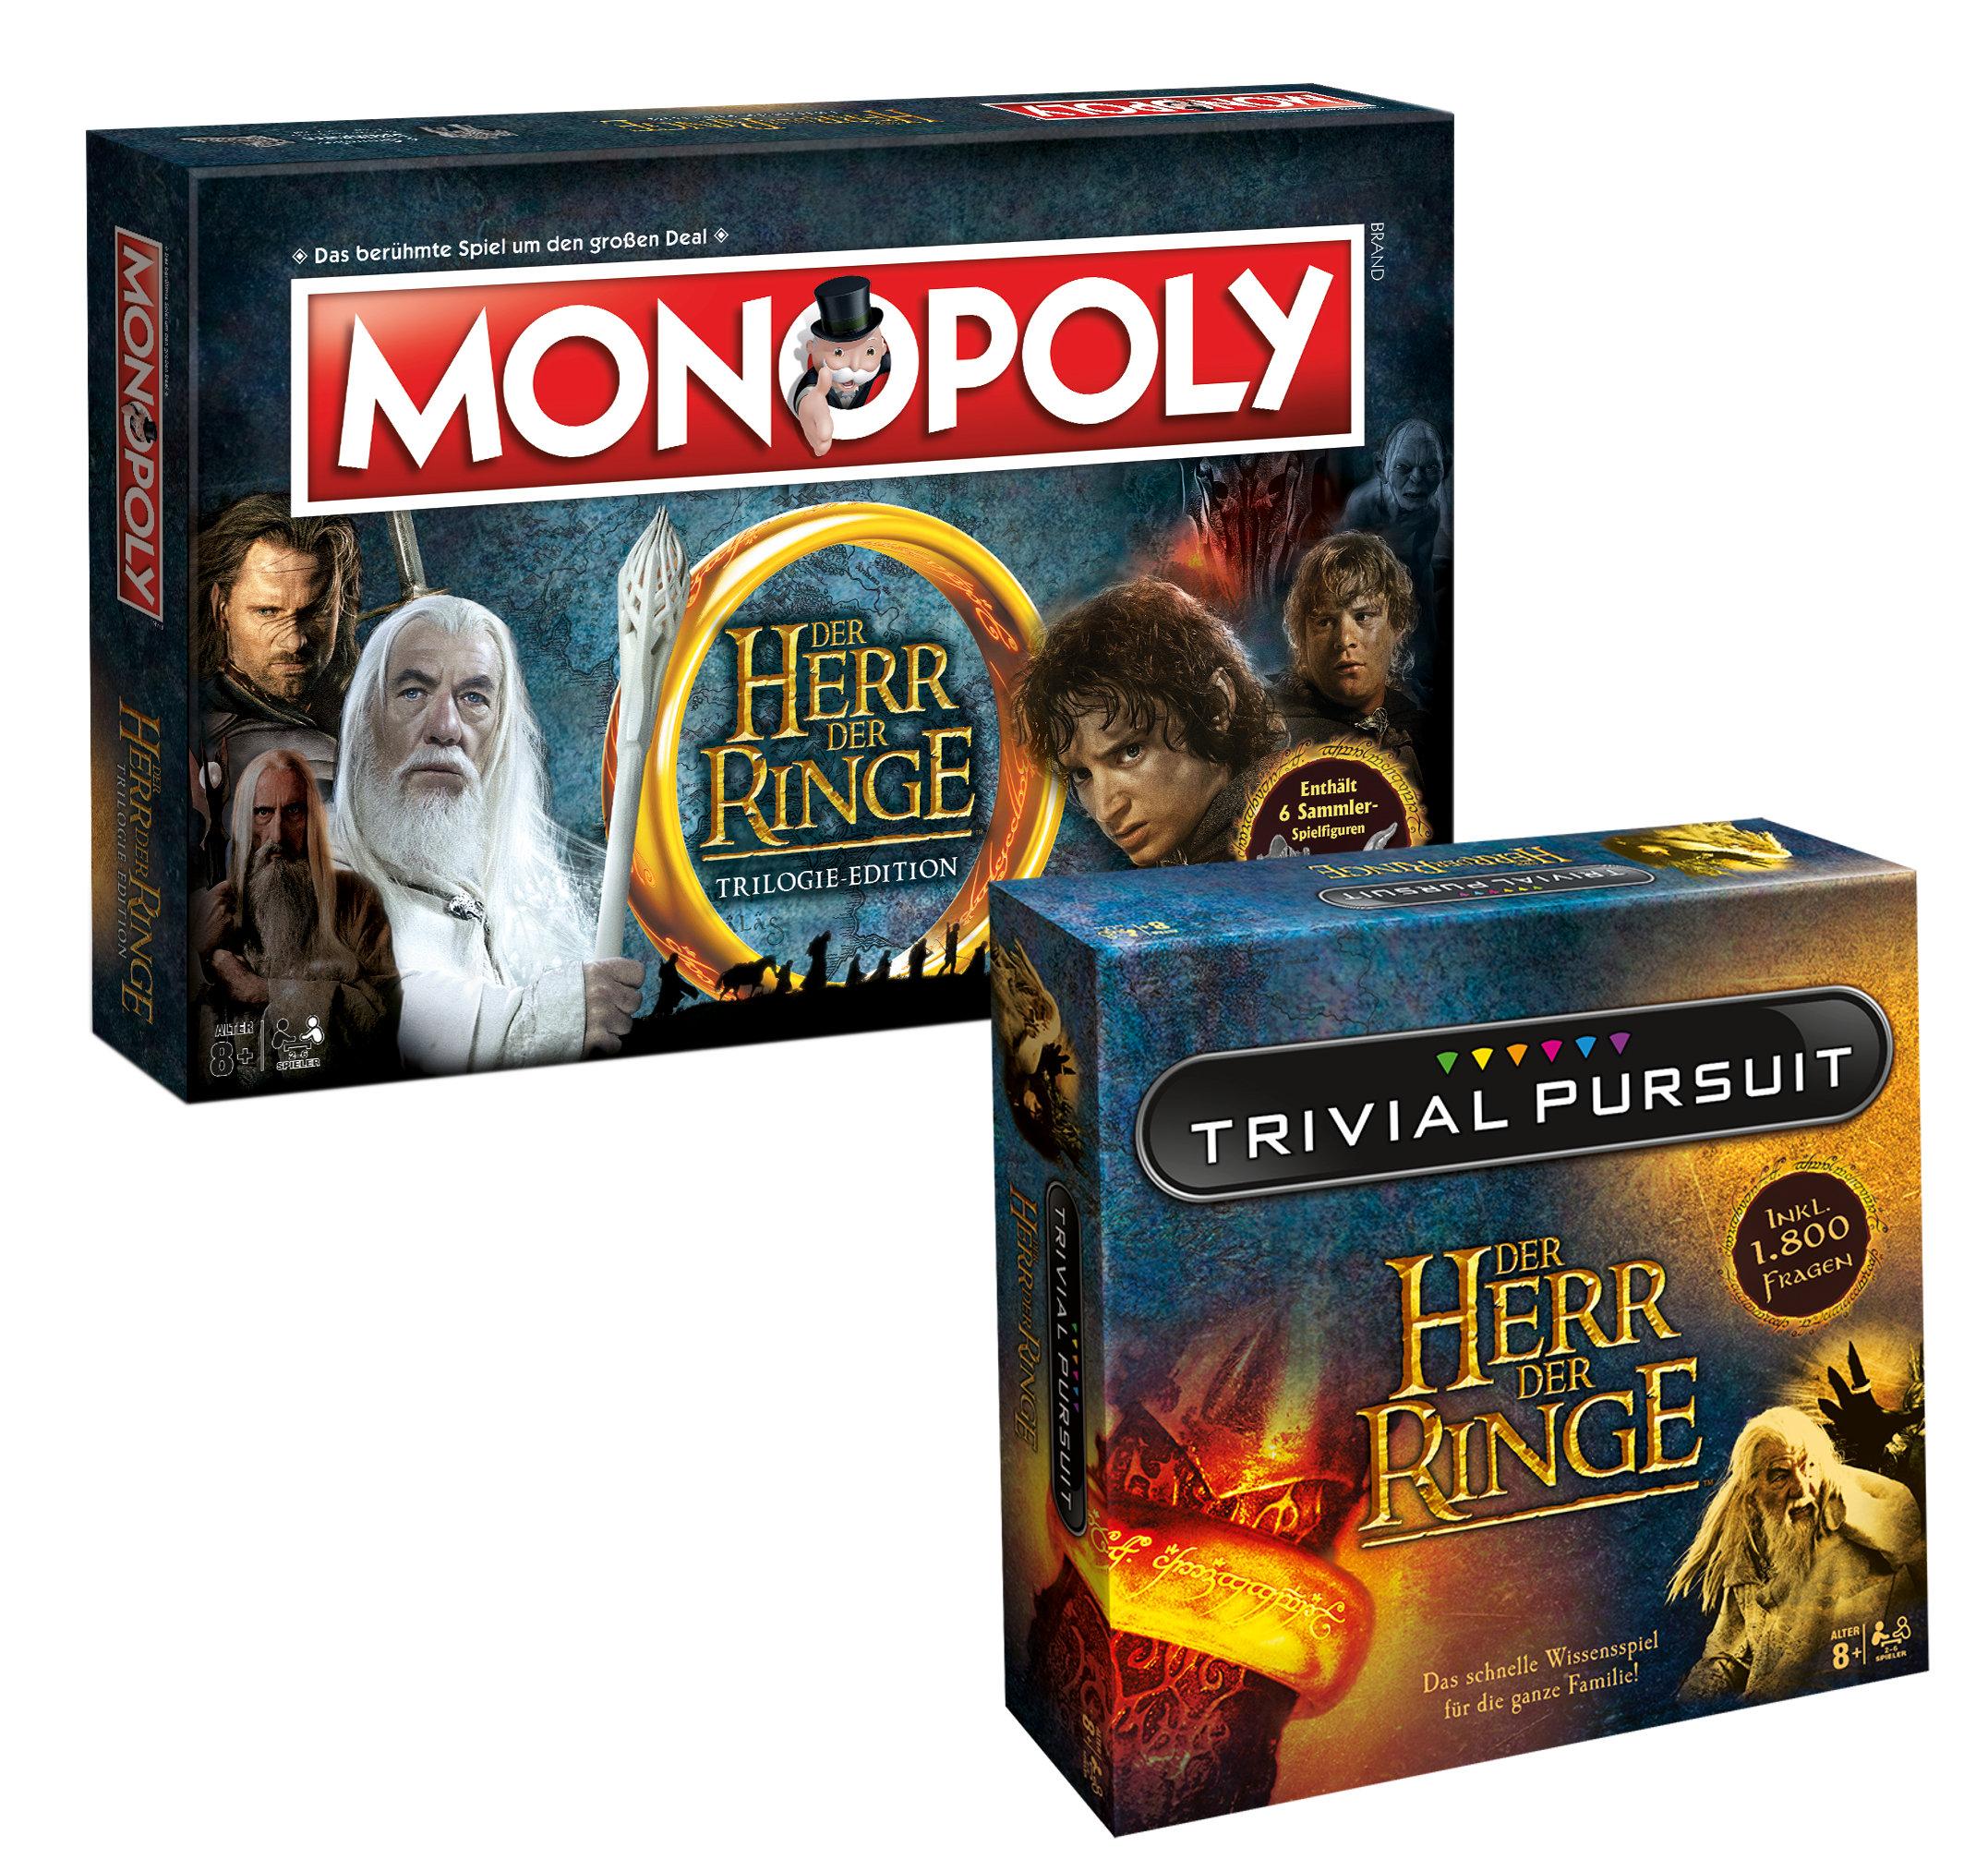 Trivial Pursuit Herr der Ringe Collector's Edition + Monopoly Bundle